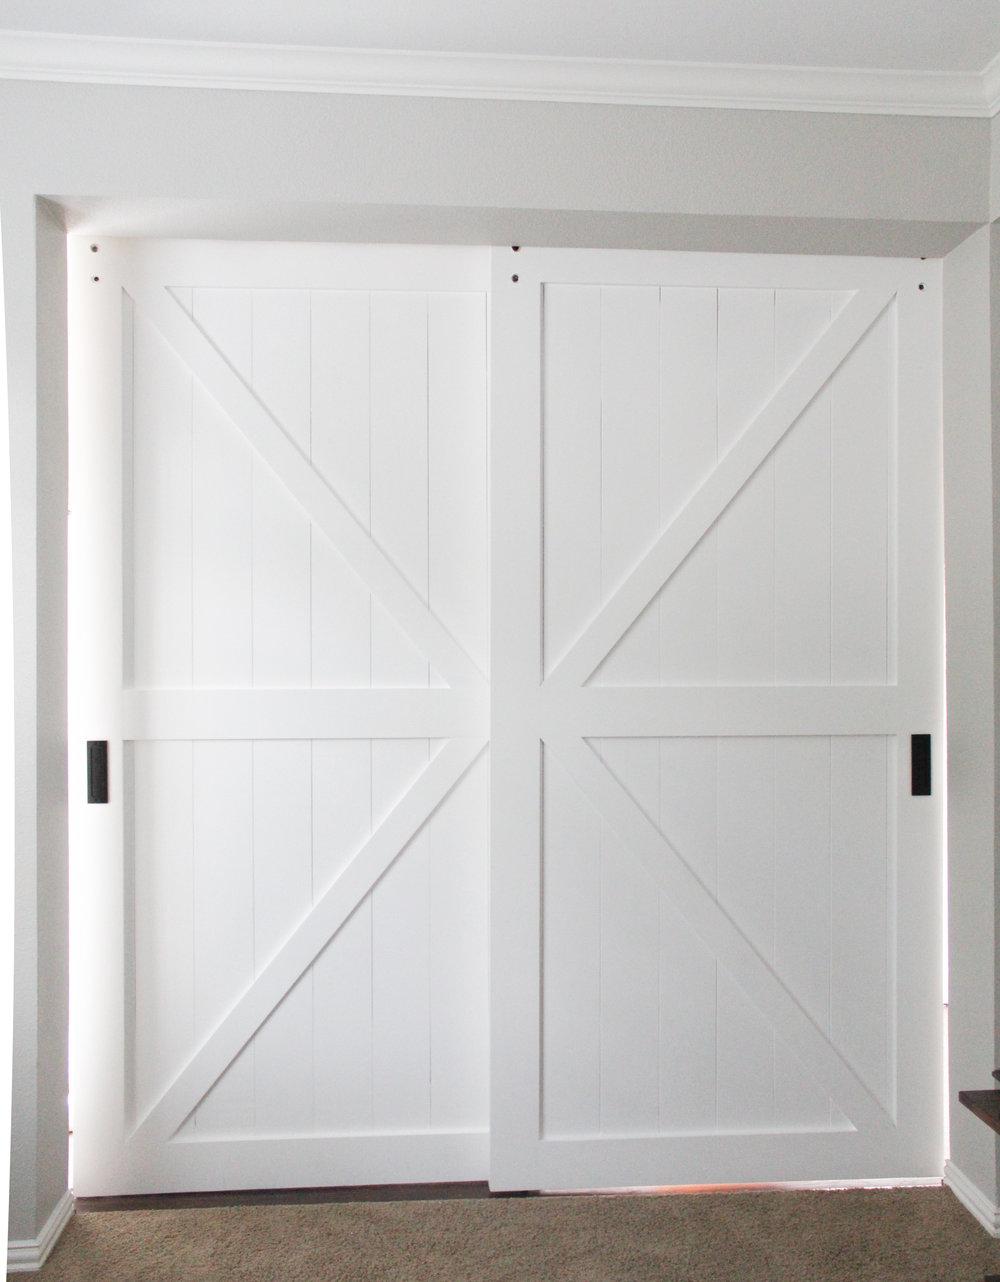 Horsfall Barn Doors 3-5.jpg